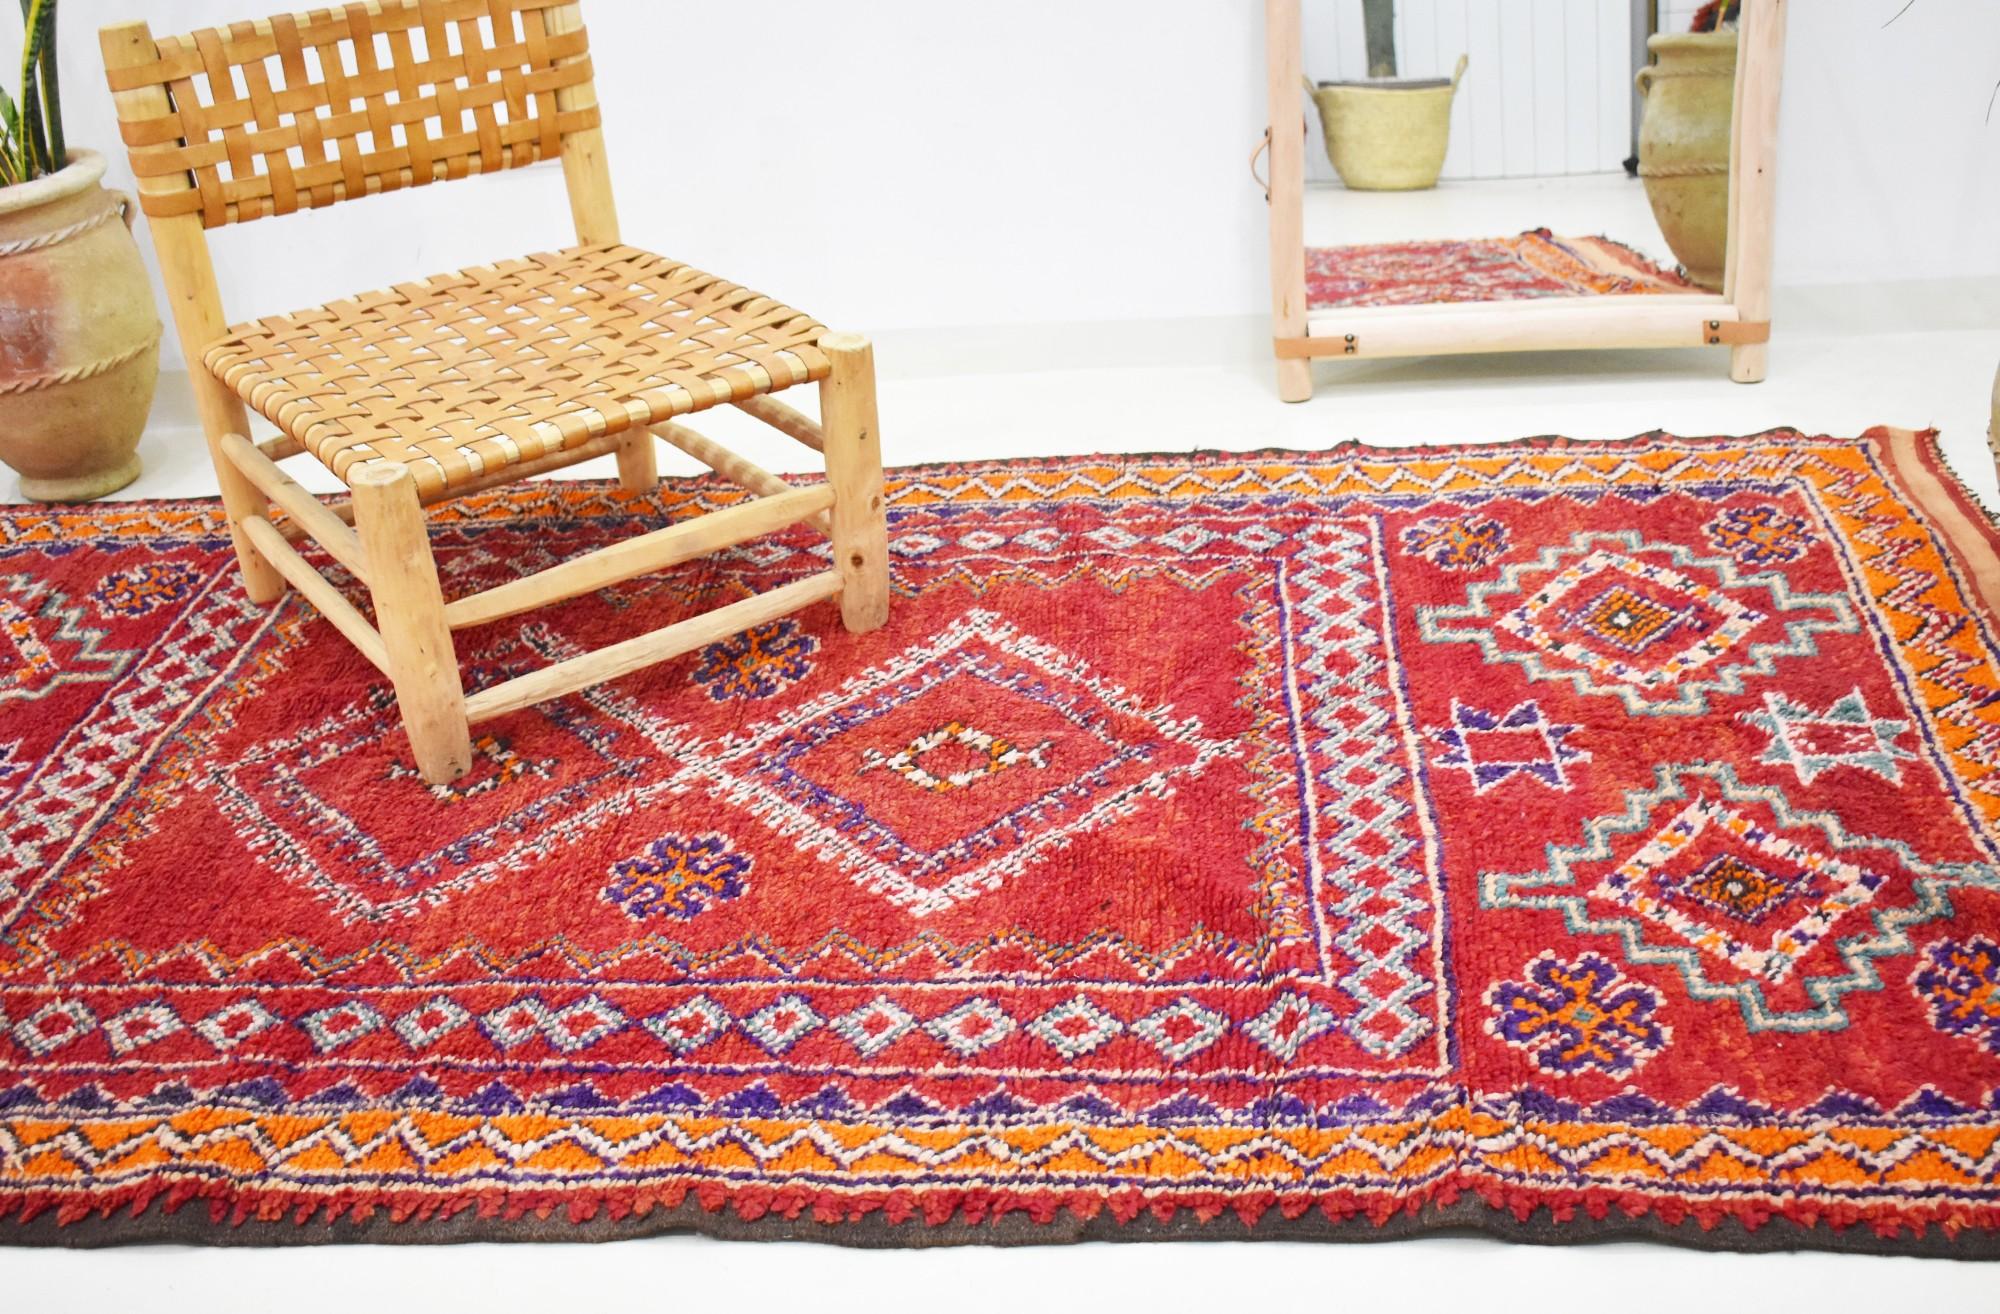 Grand tapis vintage marocain